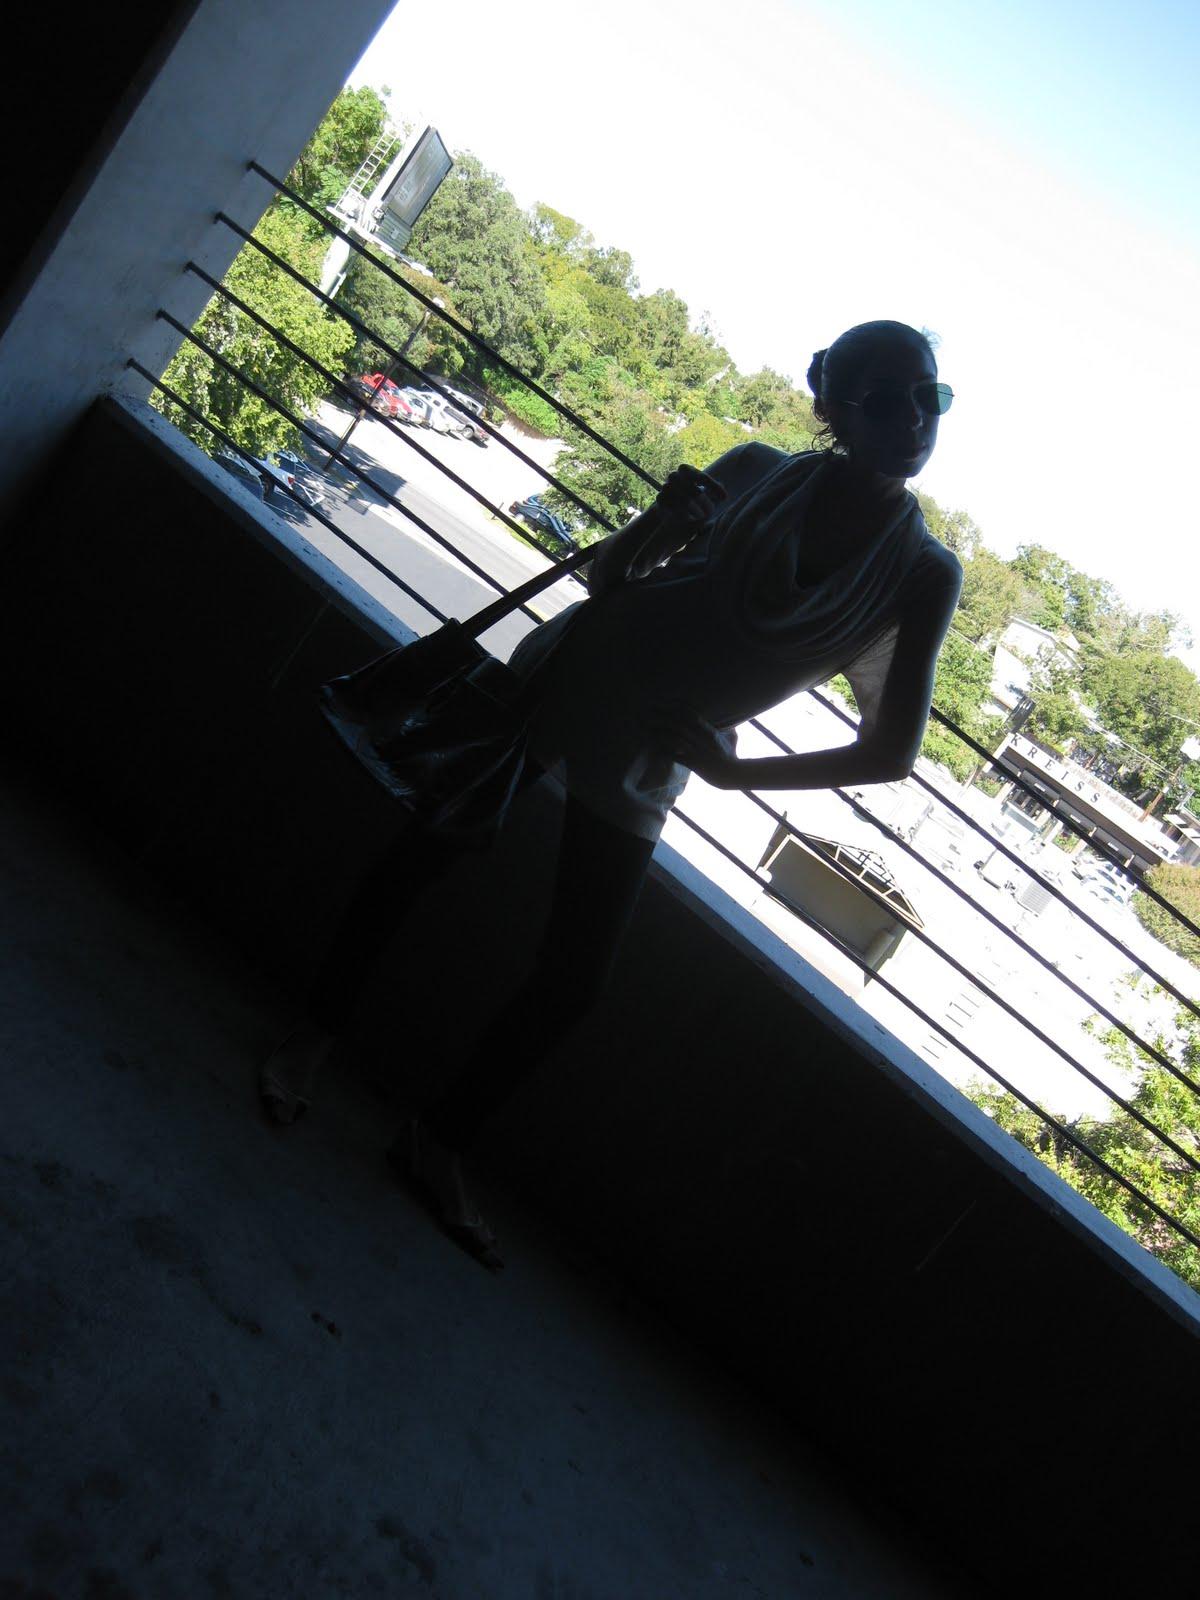 http://3.bp.blogspot.com/_JI8nxlKE9KA/TM3vinylBeI/AAAAAAAADp8/e9H0Kb8qJ5o/s1600/IMG_2349.JPG